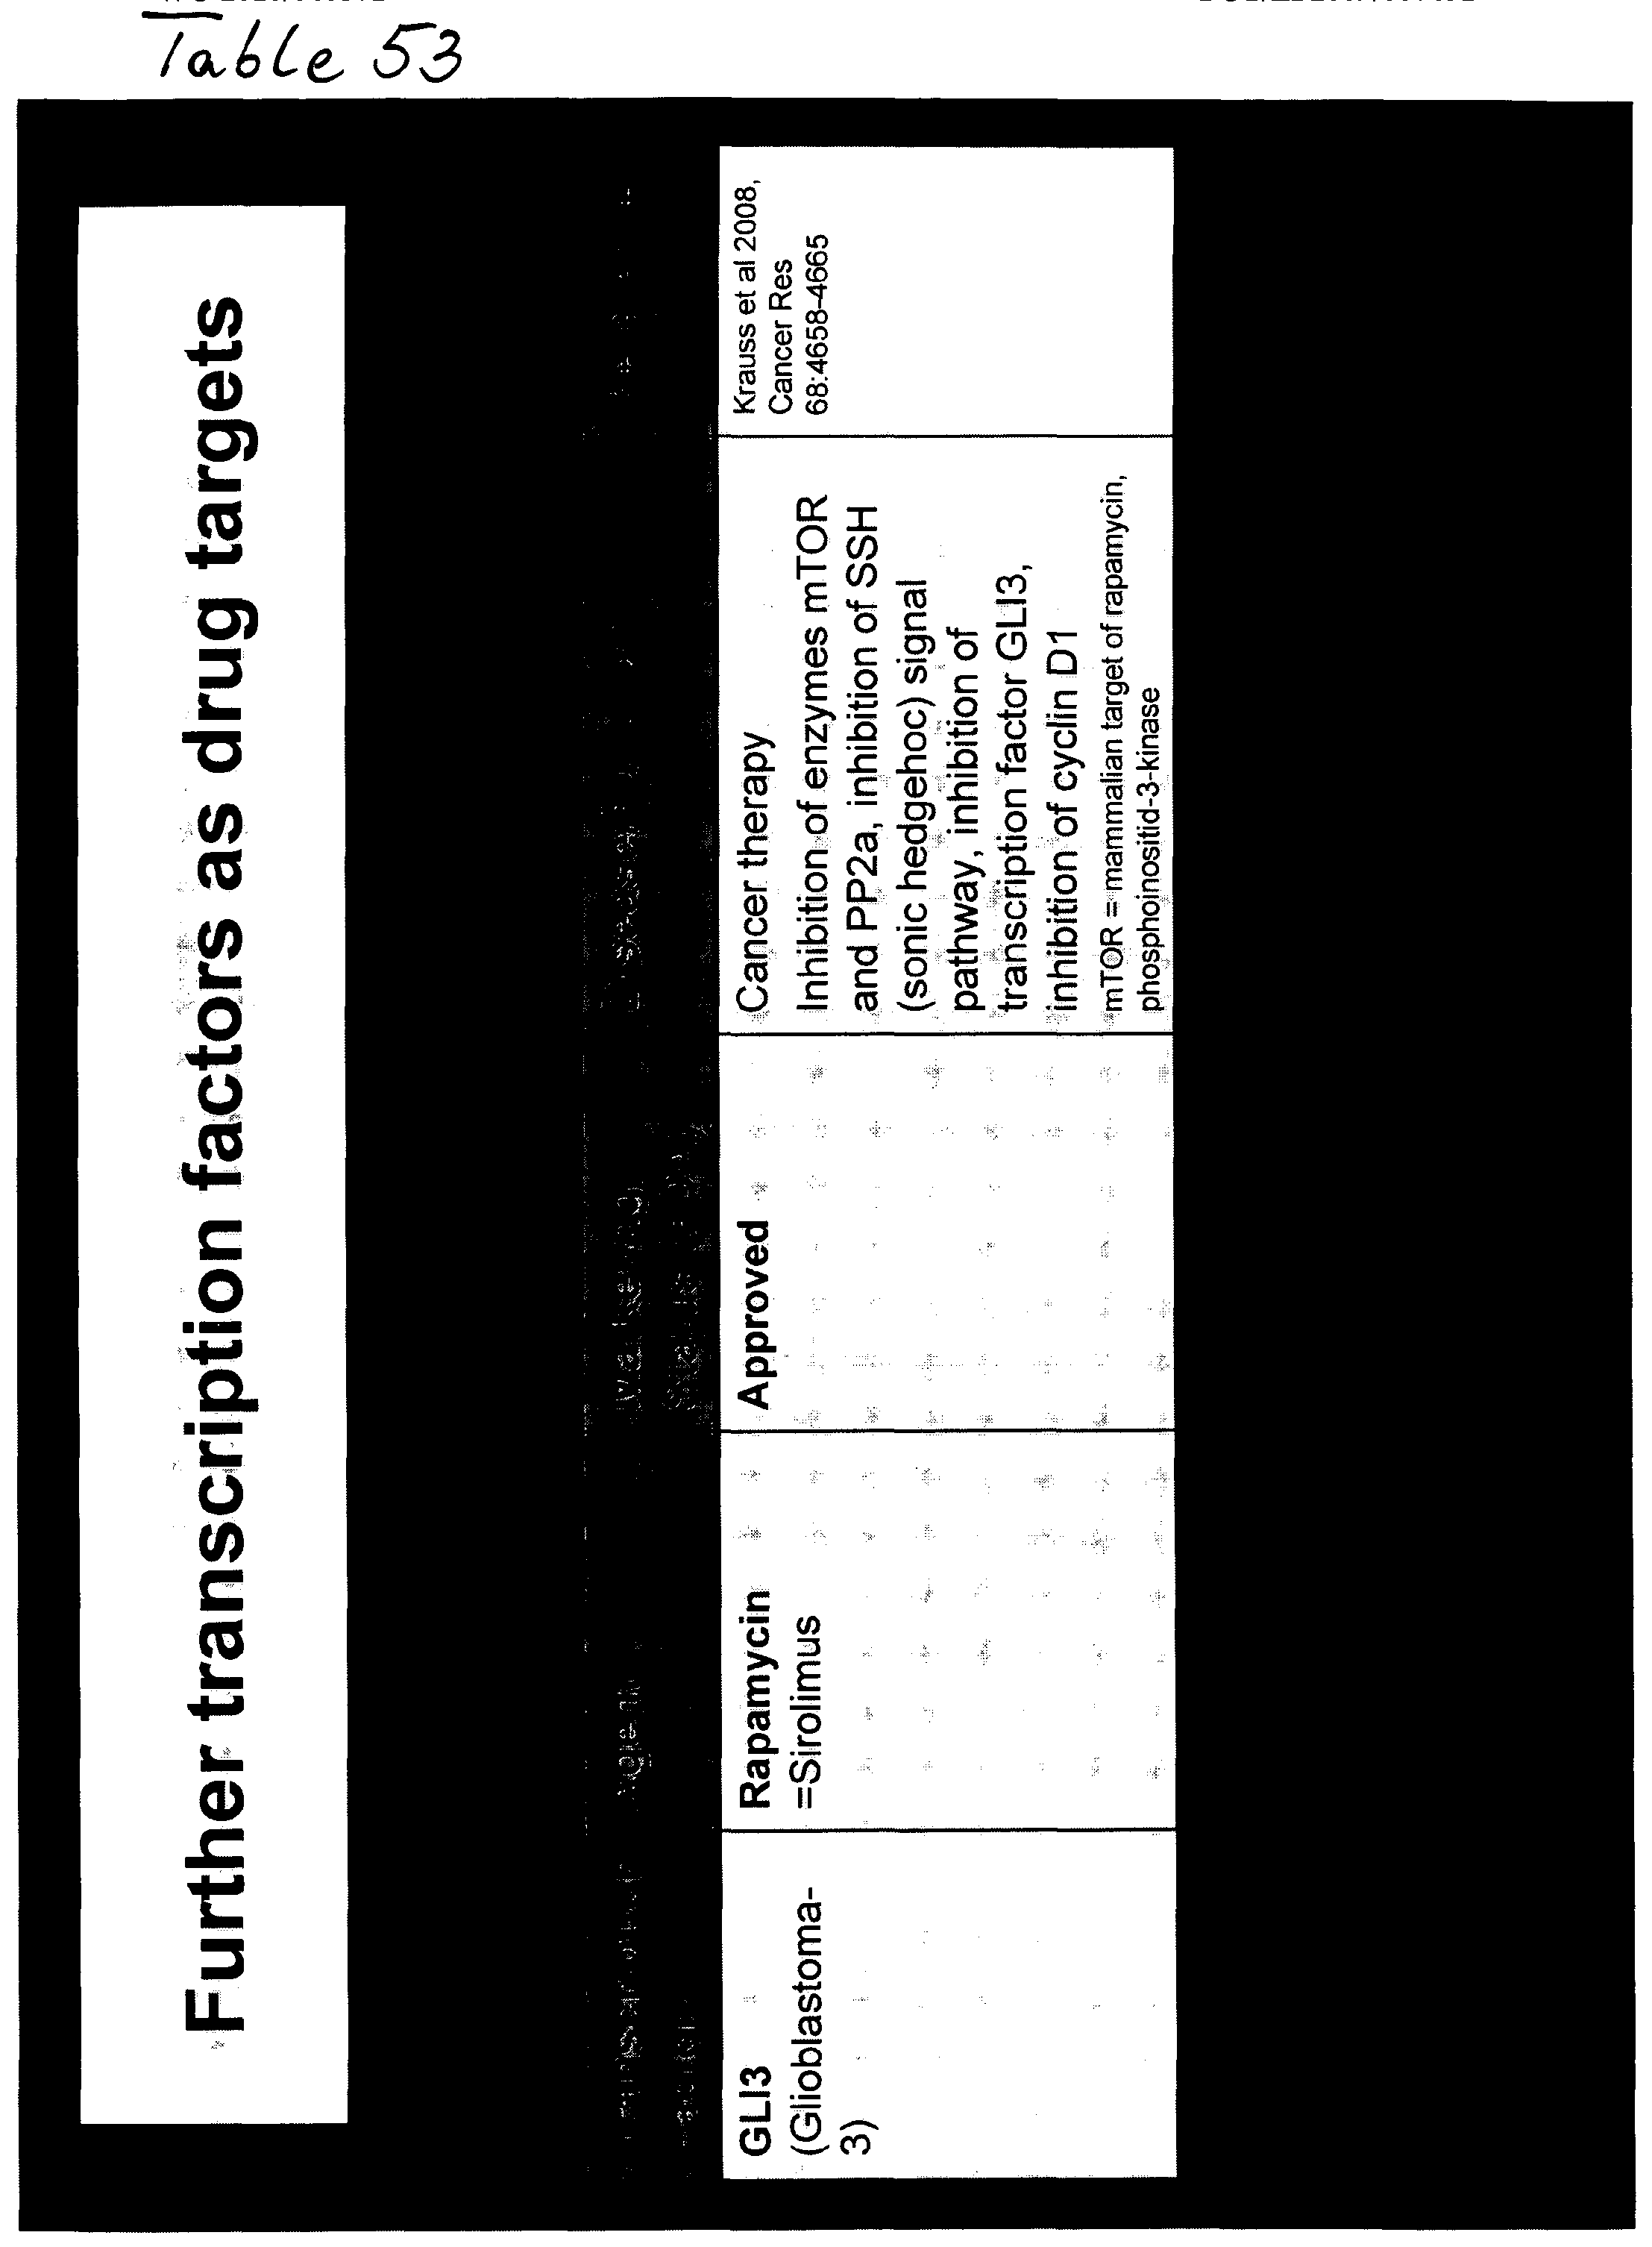 diabetes g6pc2 y alcohol